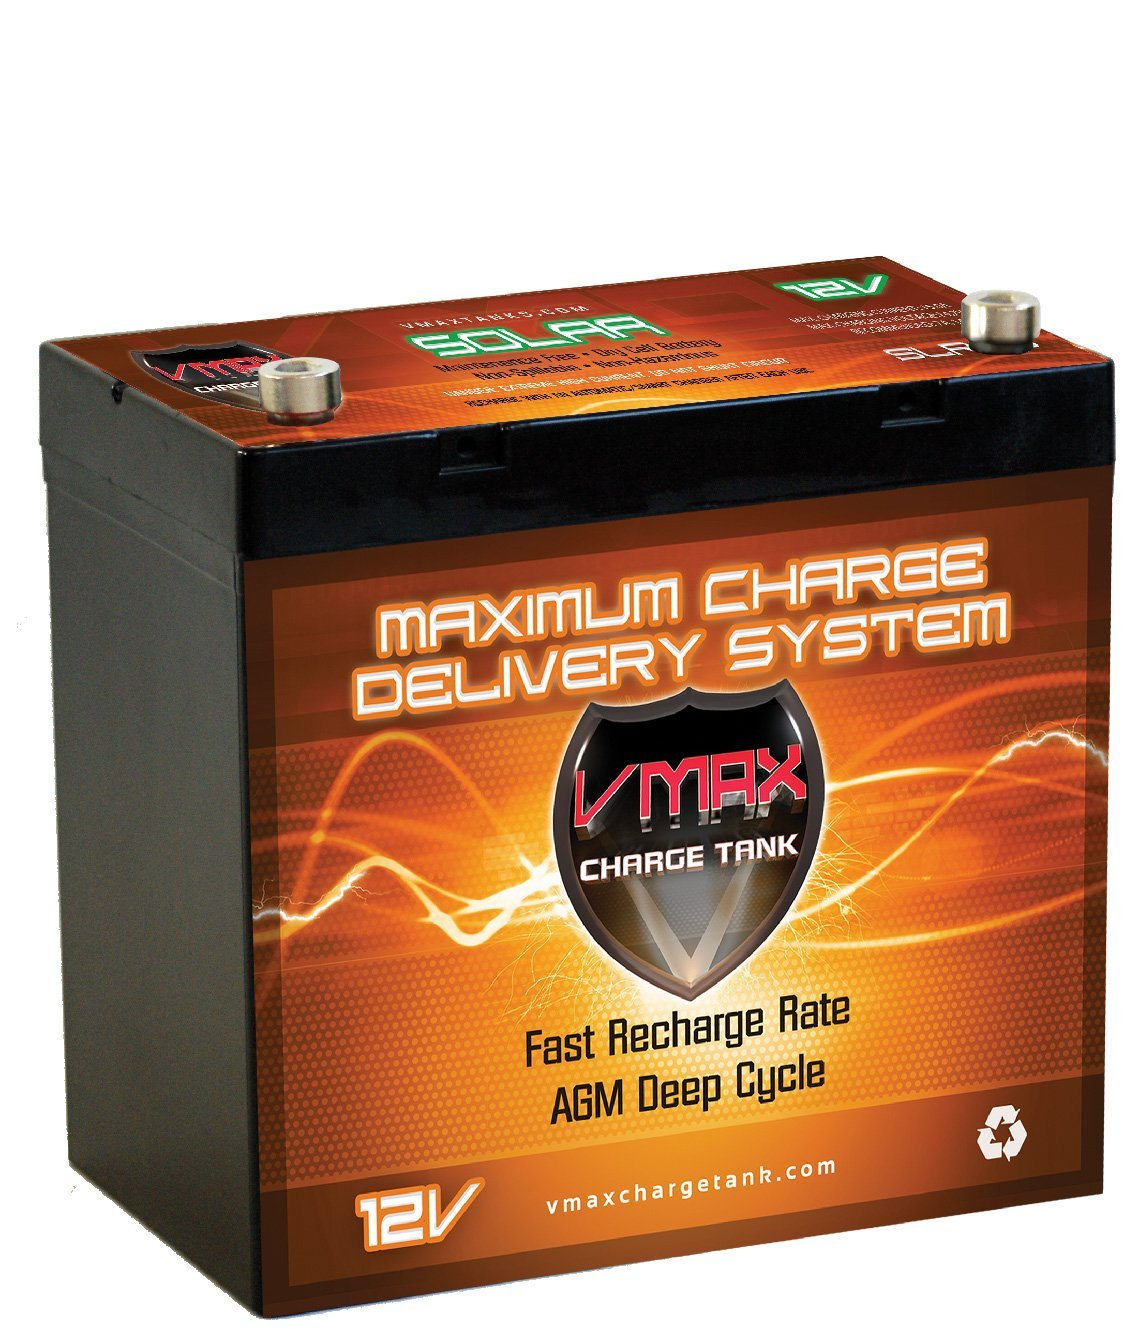 SLR60 PE POWER SOLAR WIND BOAT LIFT AGM DEEP CYCLE 60AH VMAX SOLAR BATTERY